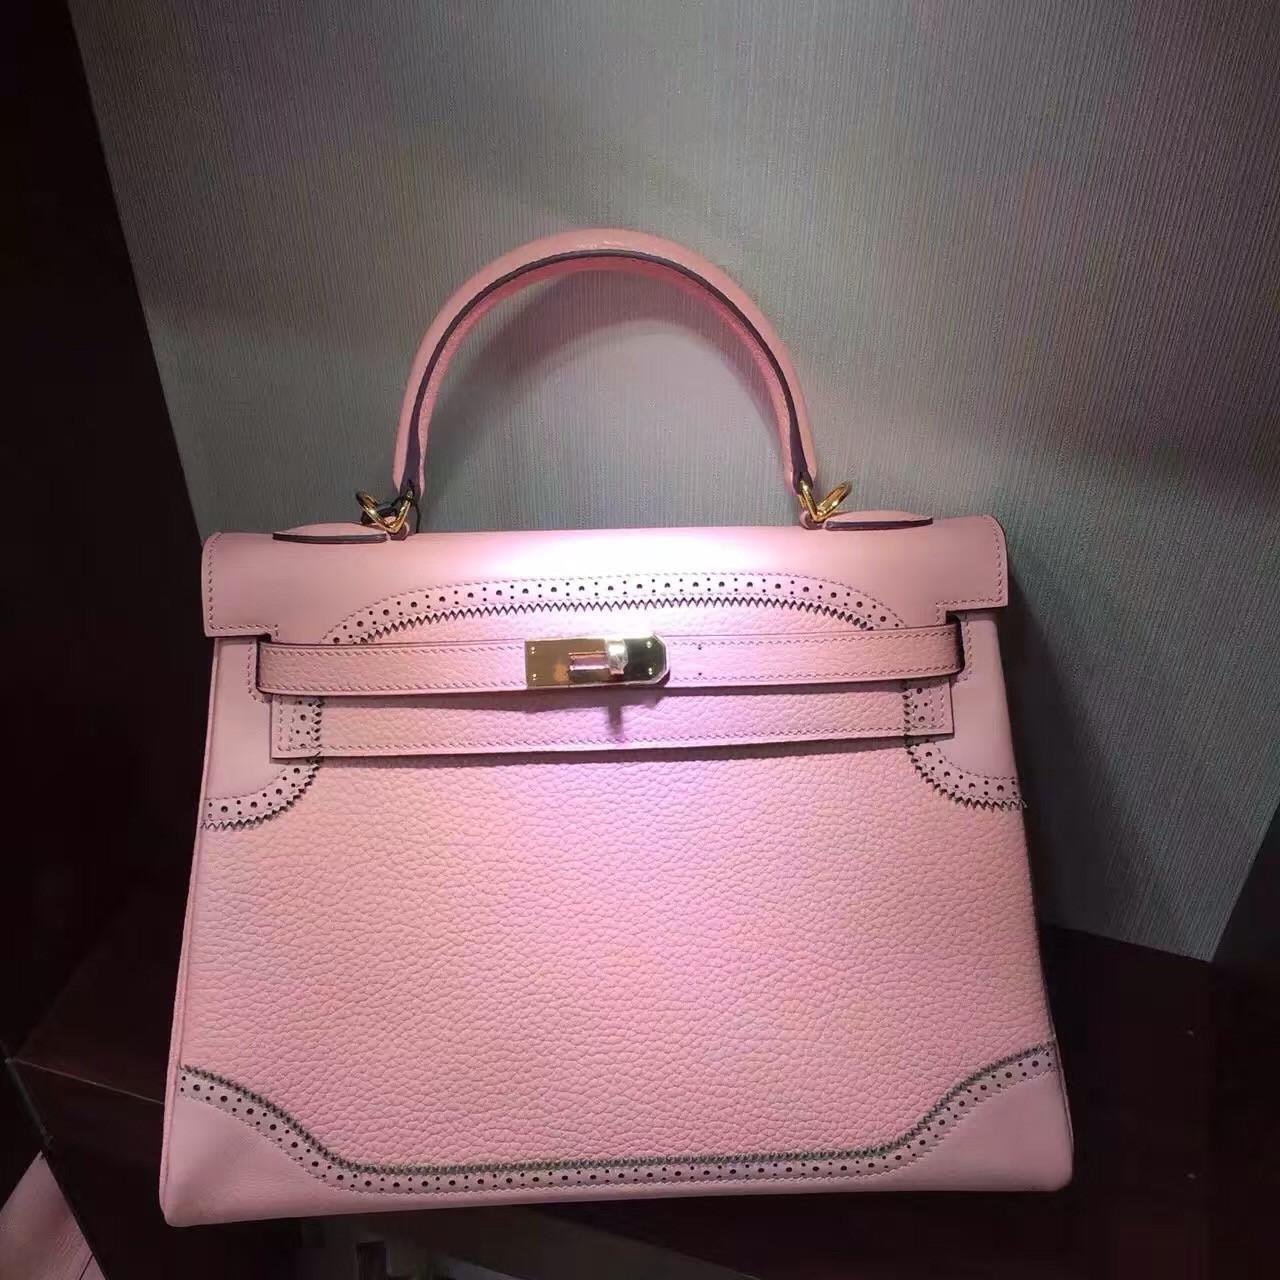 41448b619125 Hermes Limited Edition Rose Sakura 3Q Ghillie Kelly 32cm Togo Palladium  Hardware